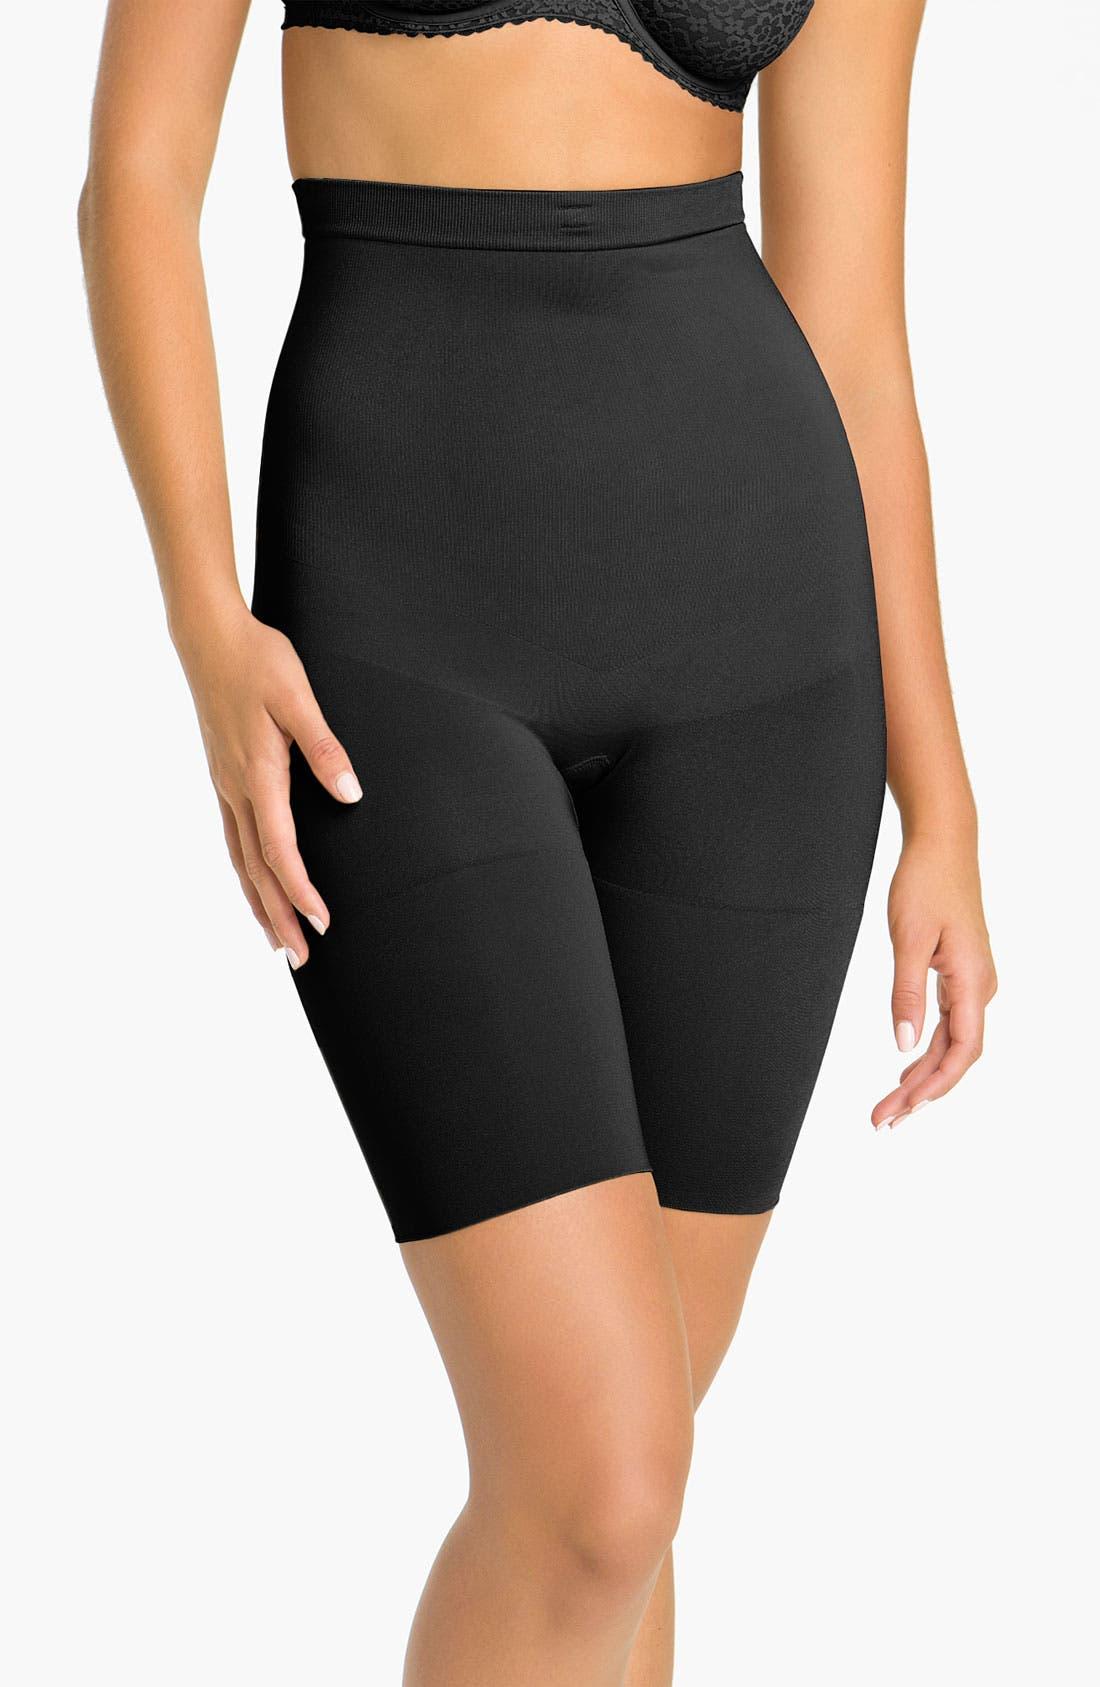 Main Image - SPANX® 'Slim Cognito' Mid-Thigh Bodysuit Shaper